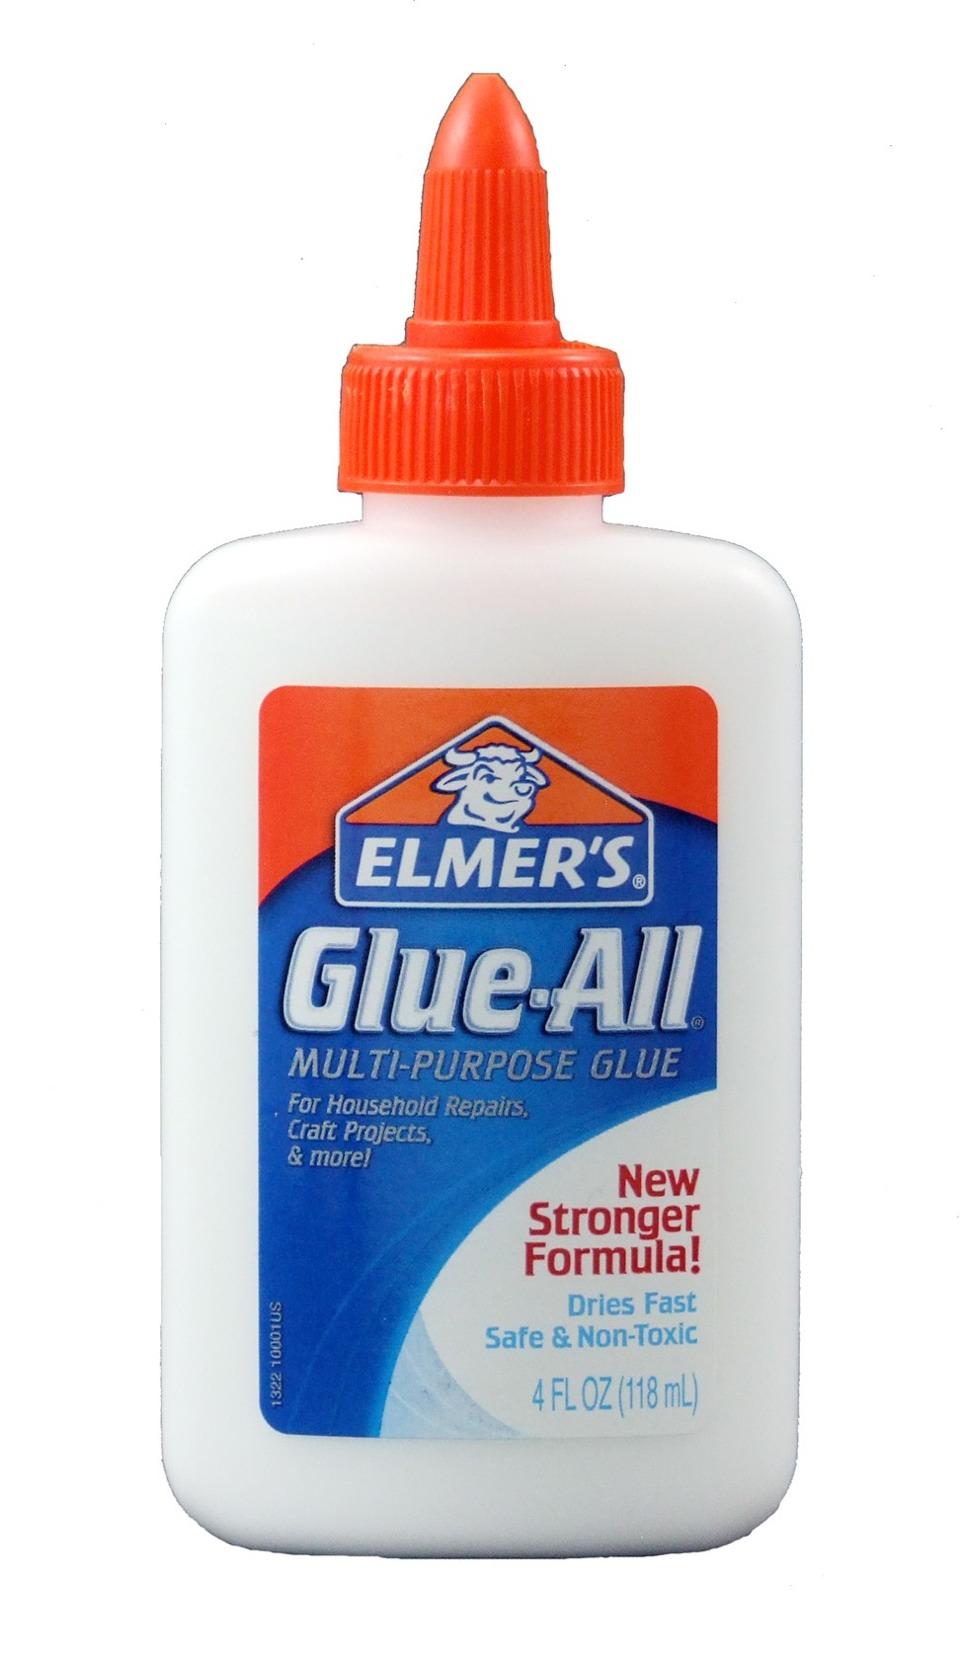 how to get rid of super glue off skin